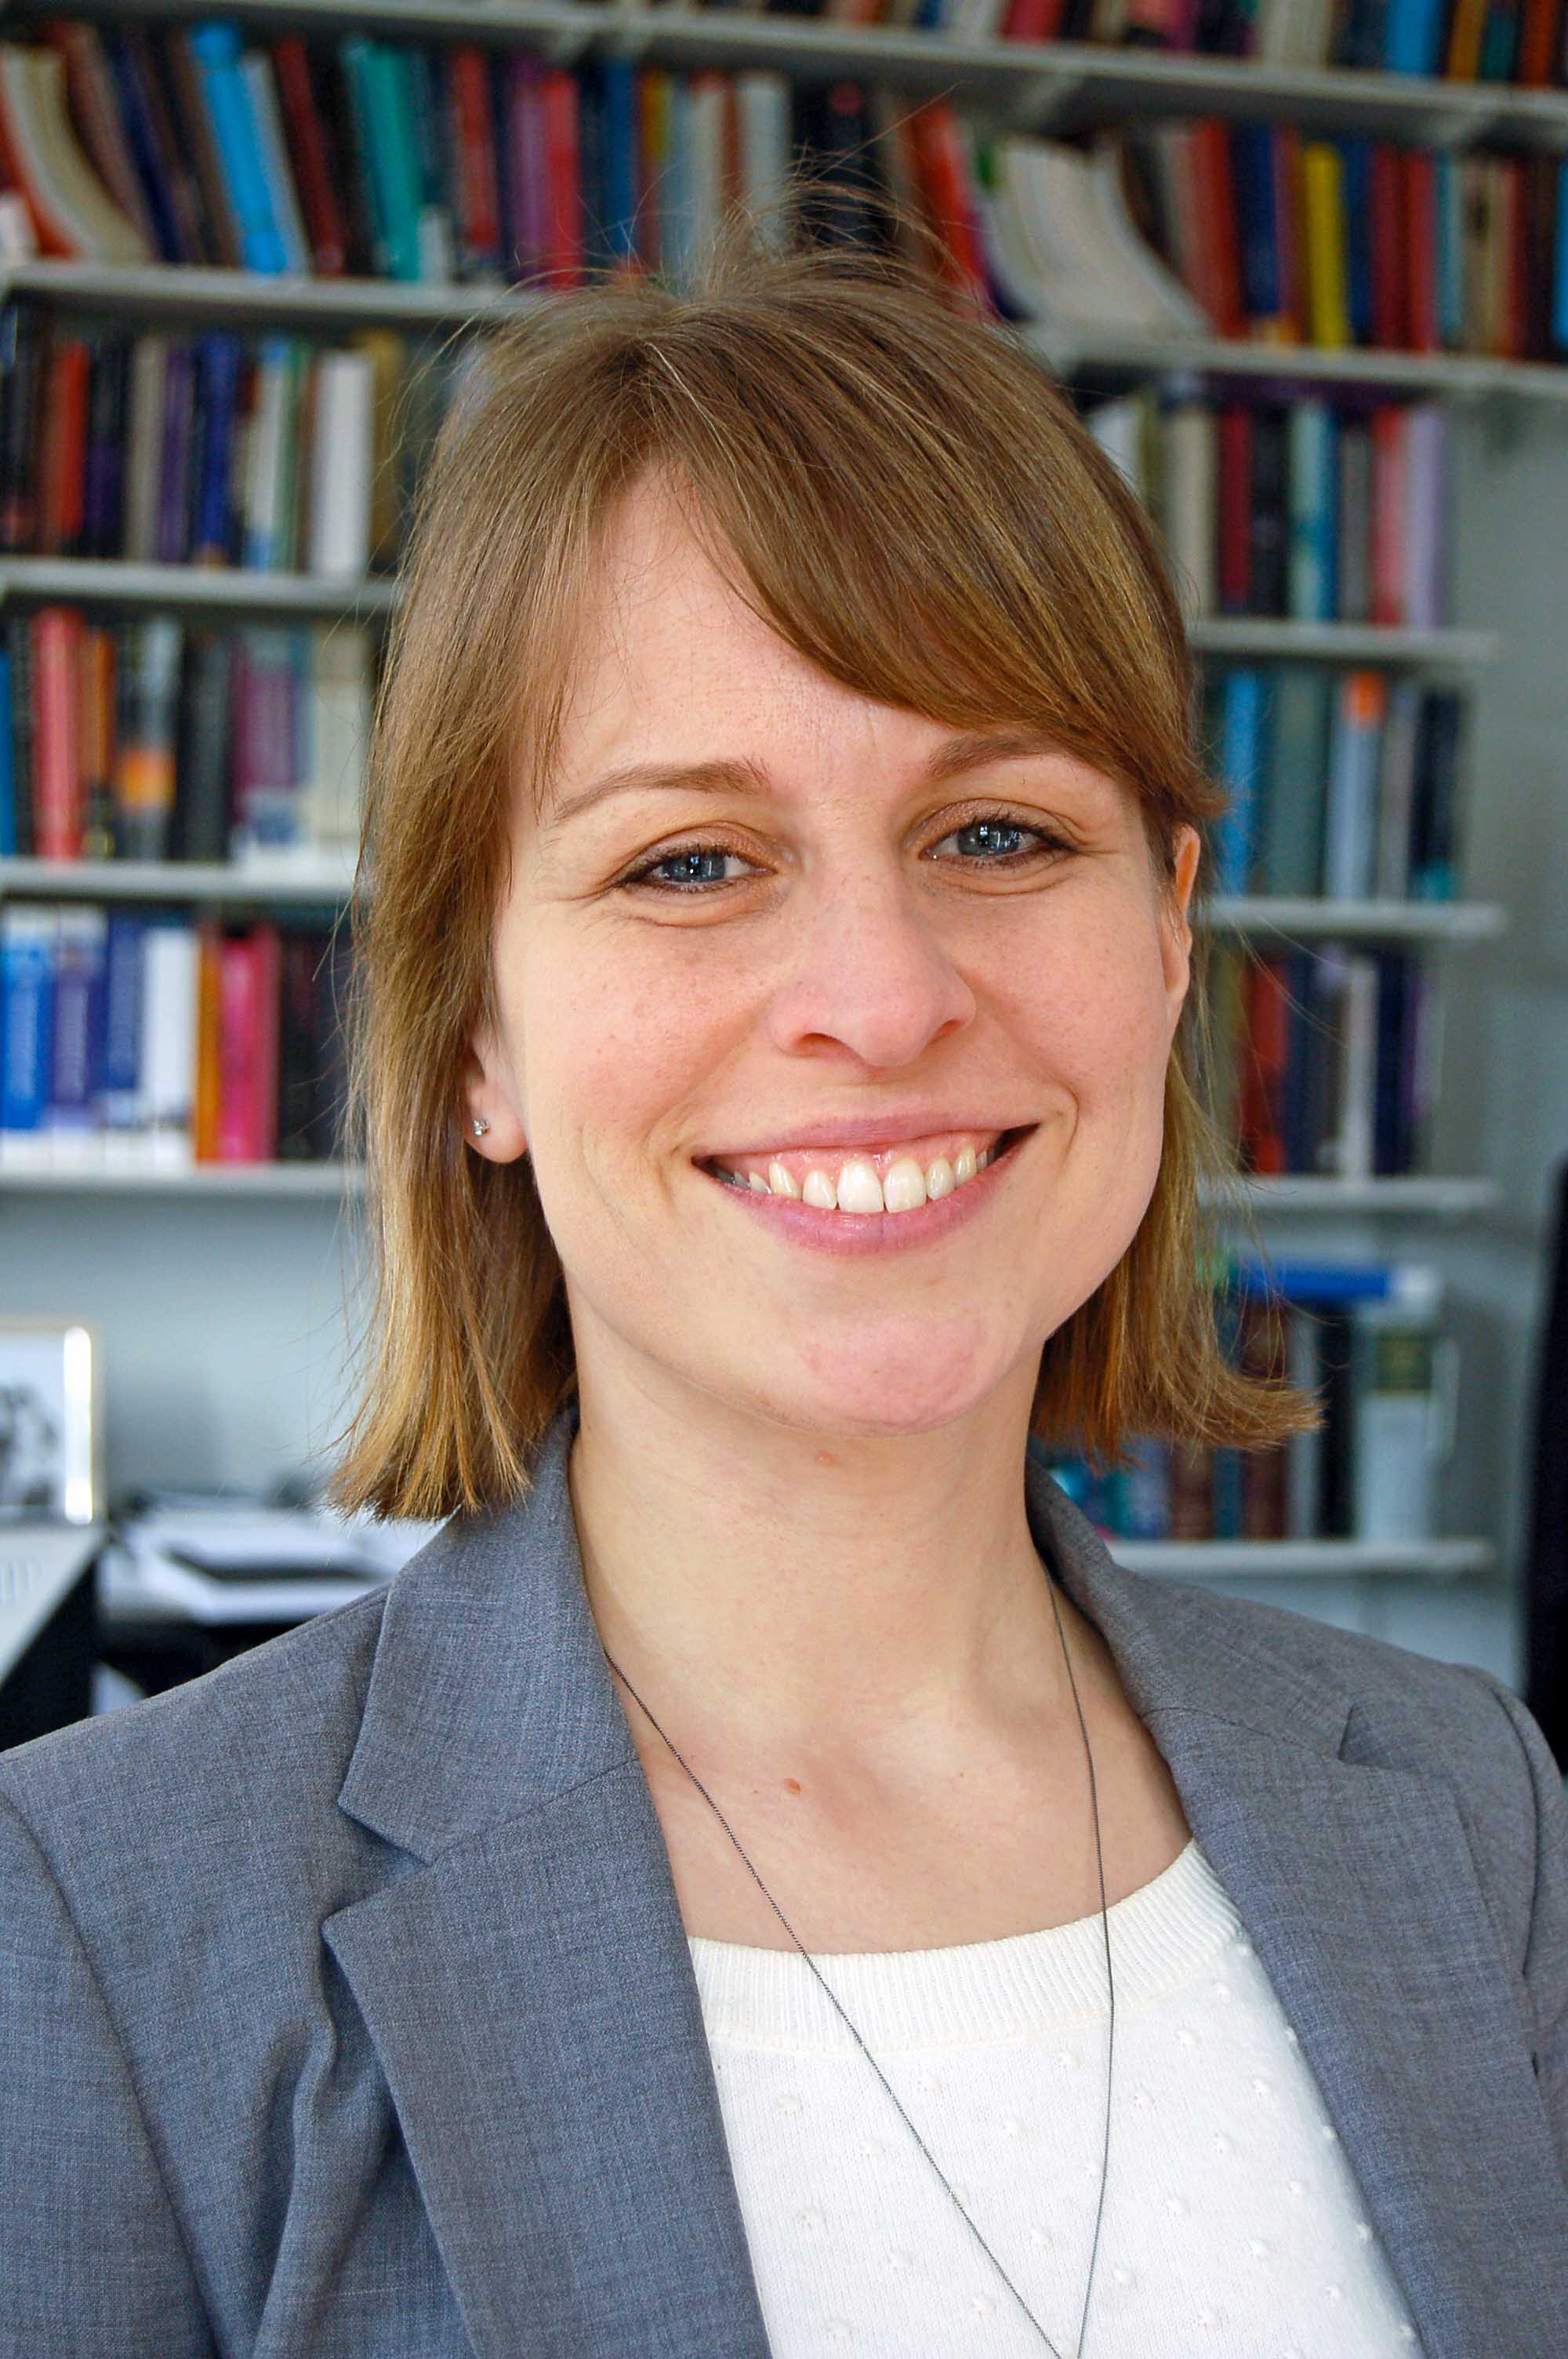 Lise Smit